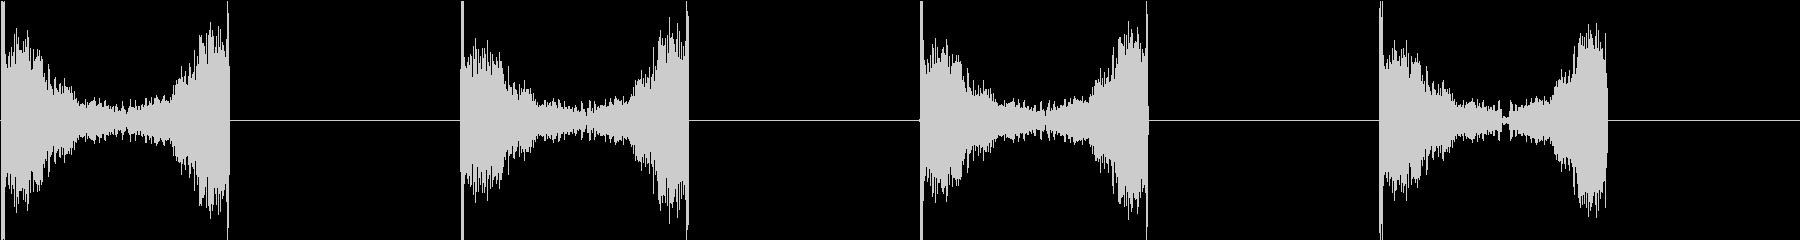 DJプレイ スクラッチ・ノイズ 30の未再生の波形